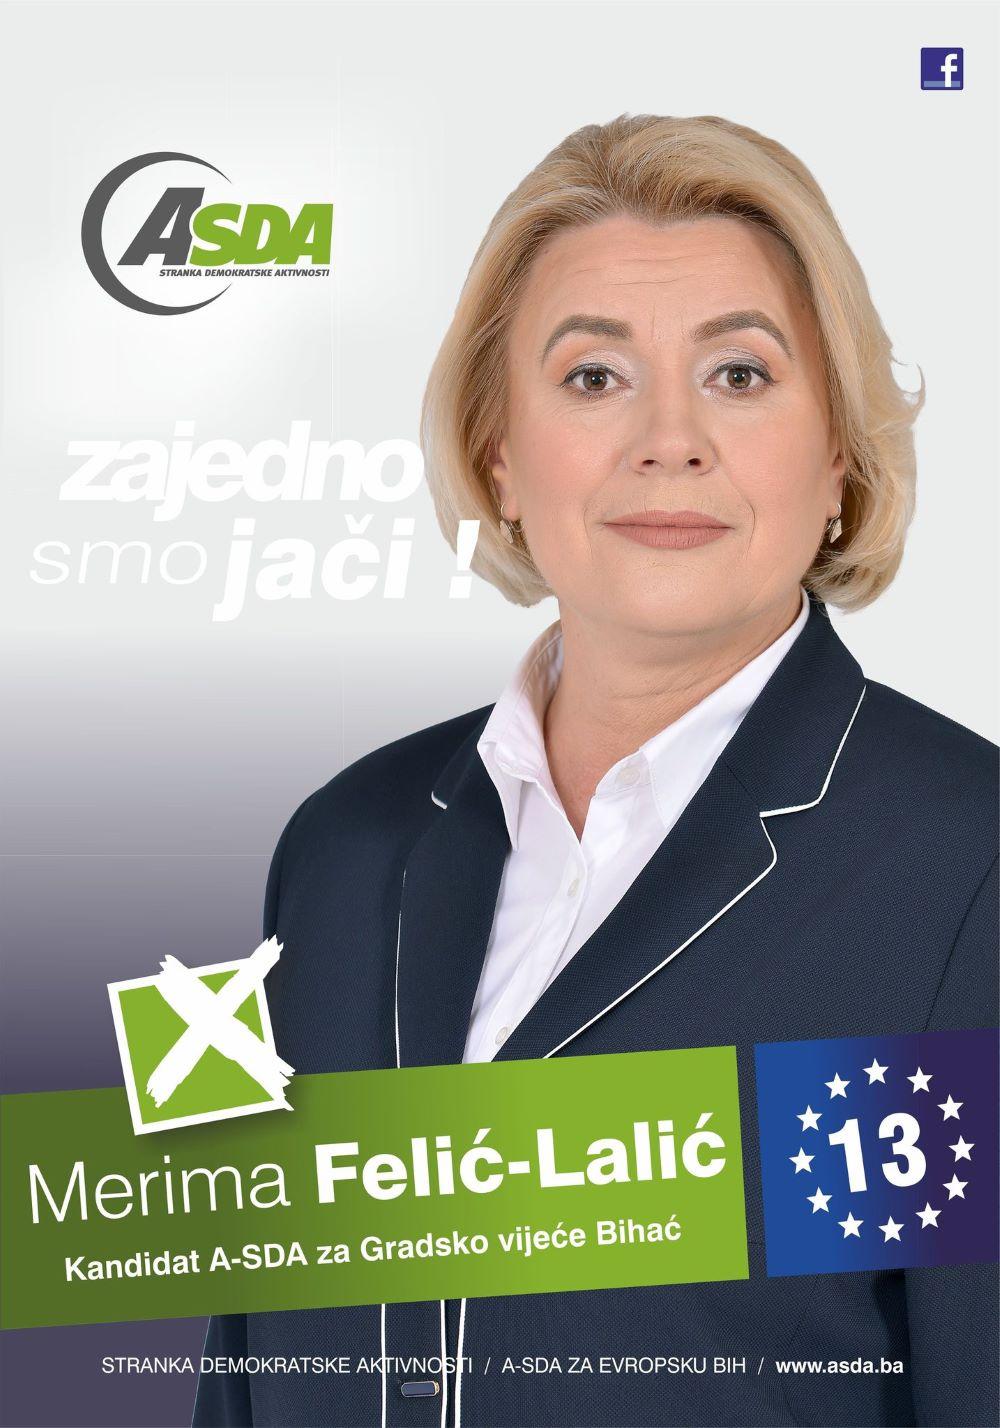 Merima Felić-Lalić